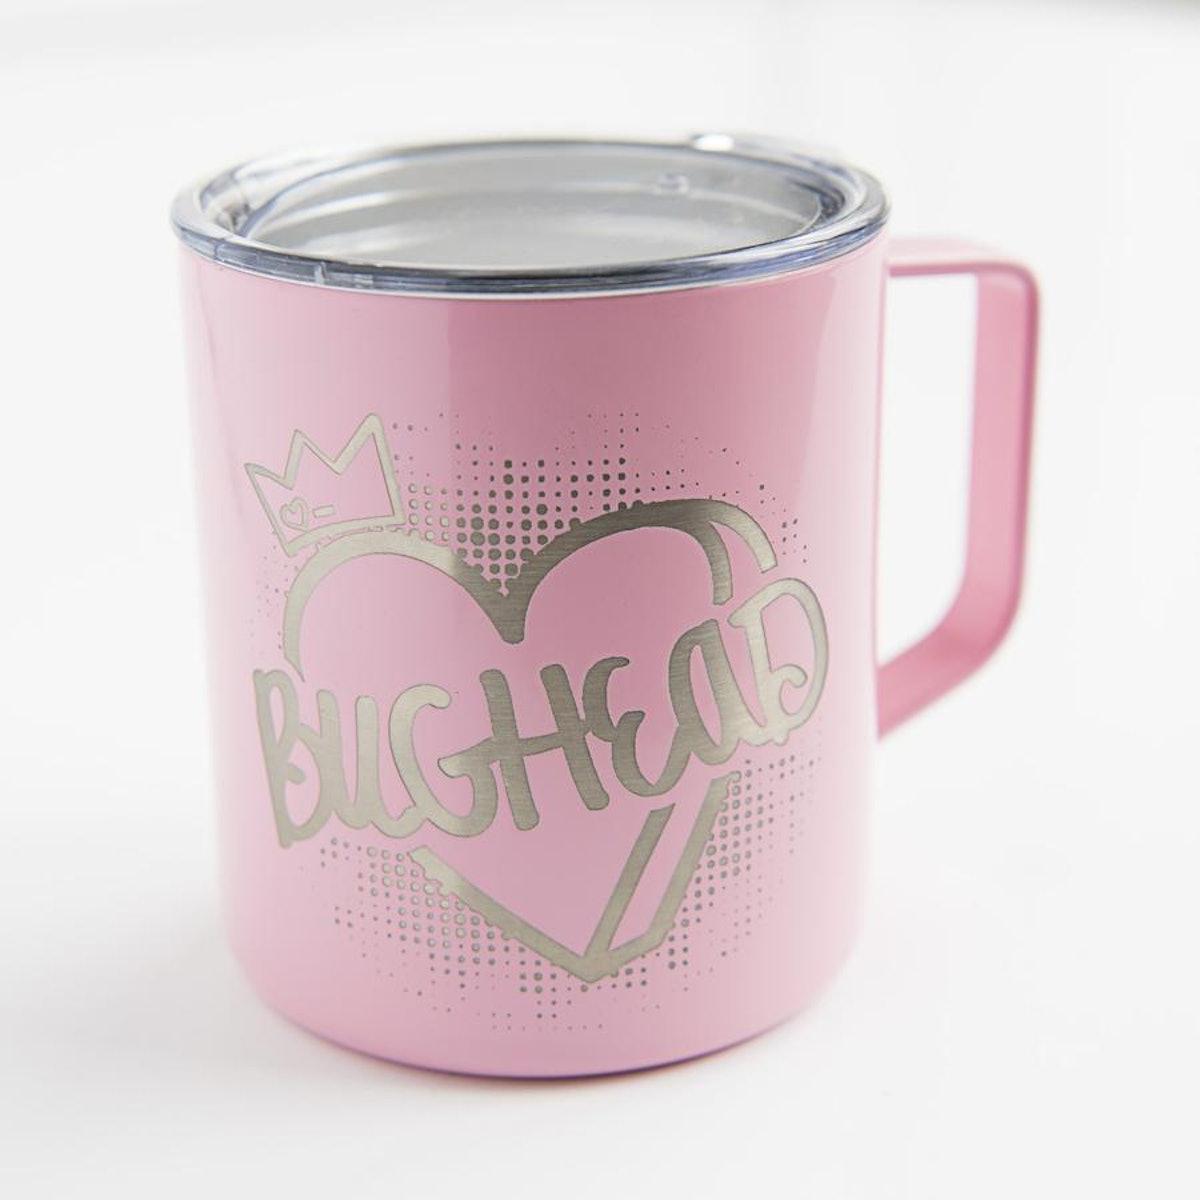 Bughead Coffee Mug